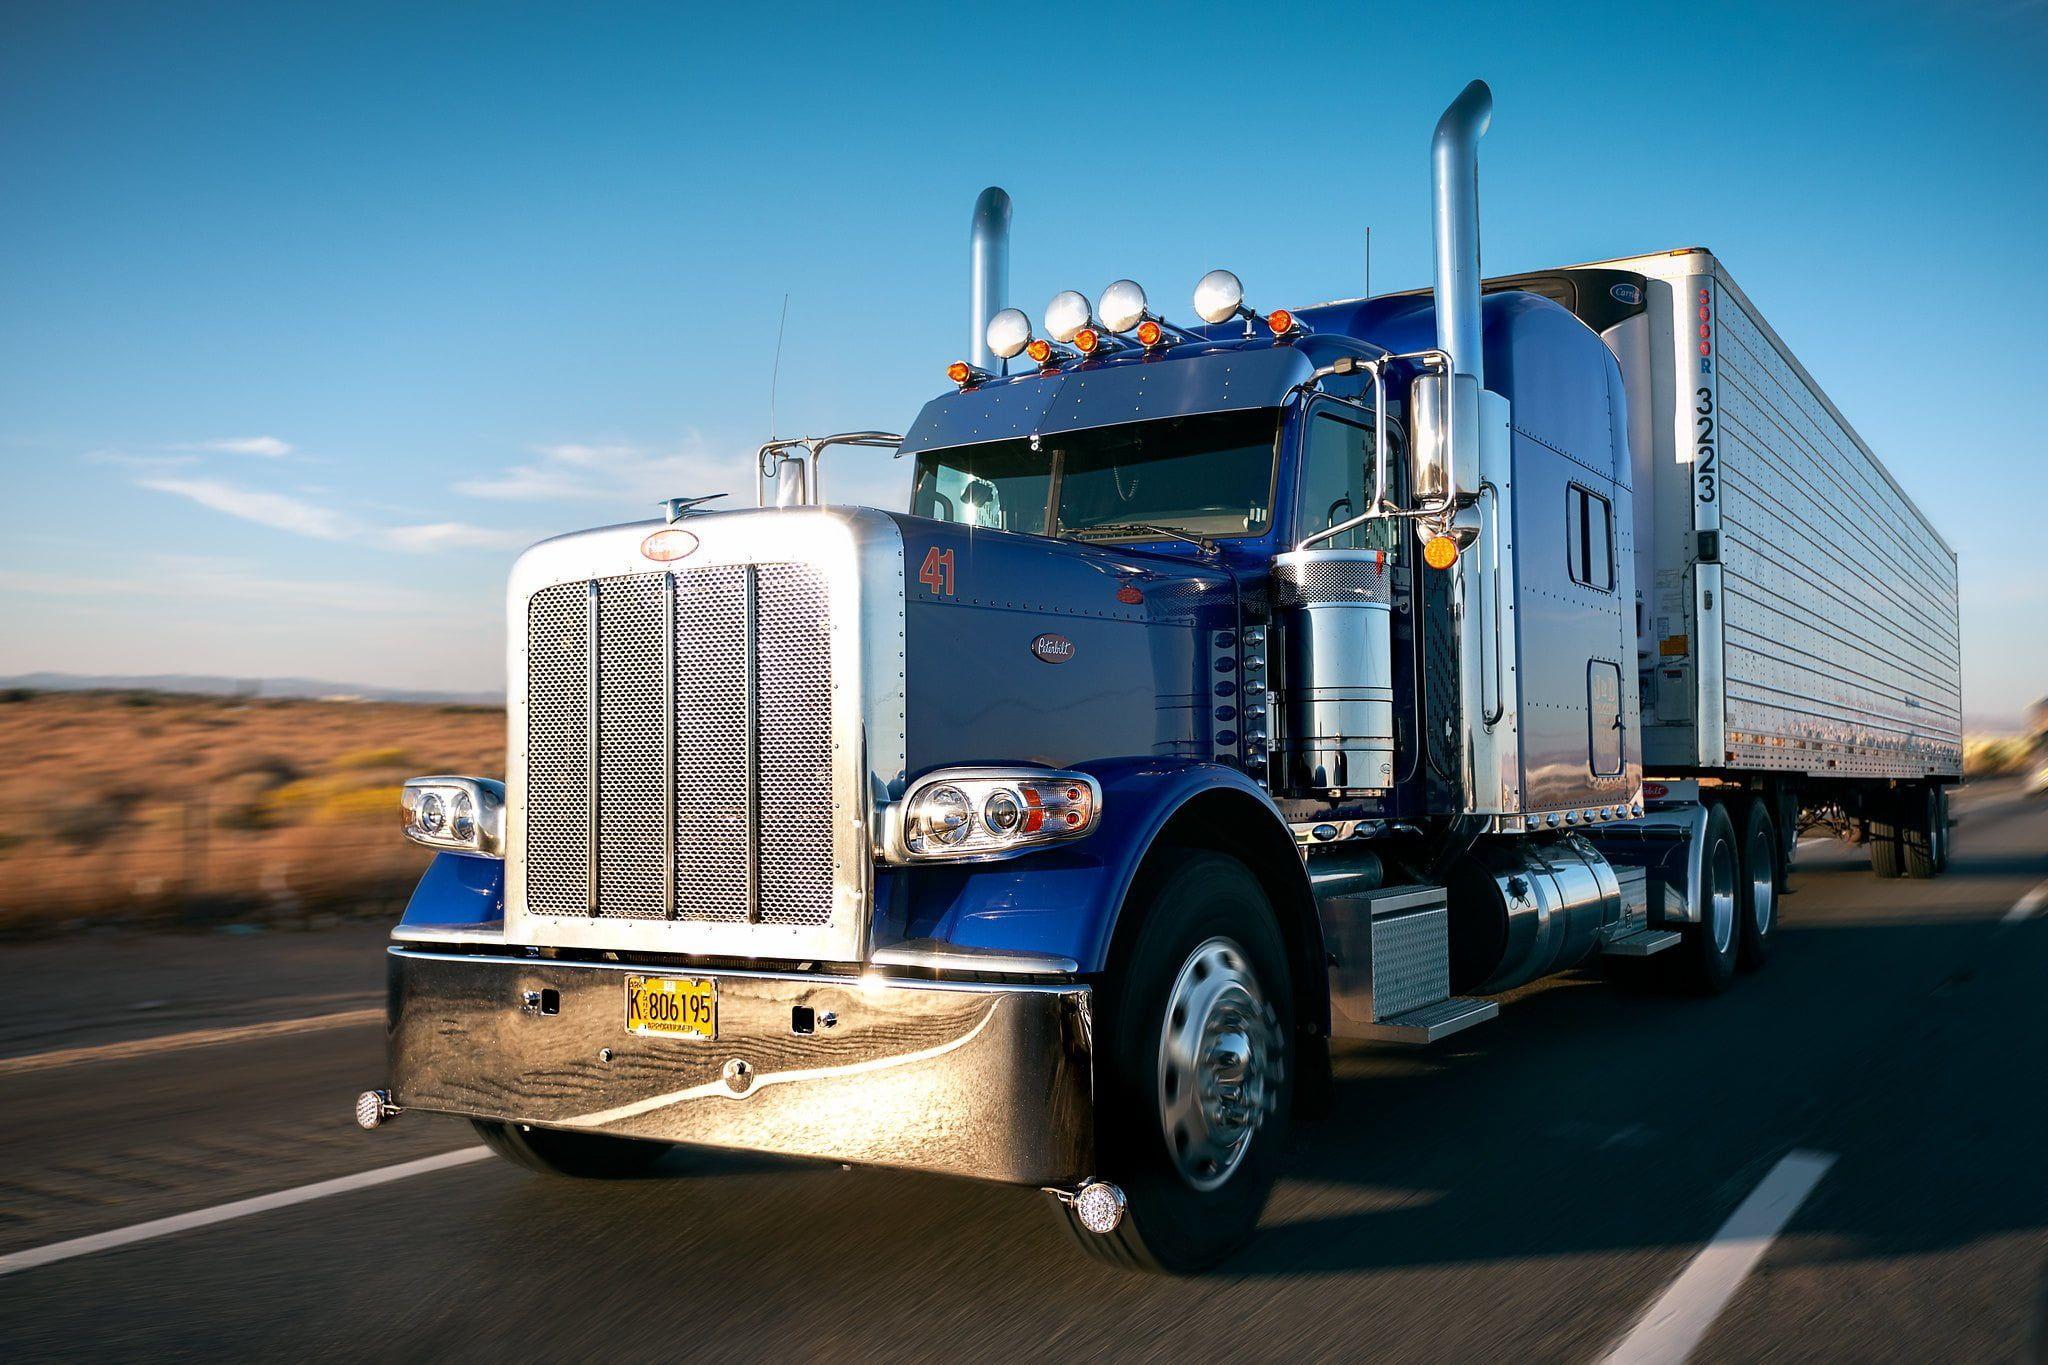 Vehicles Peterbilt Truck Vehicle 1080p Wallpaper Hdwallpaper Desktop In 2020 Trucks Super Cars New Cars